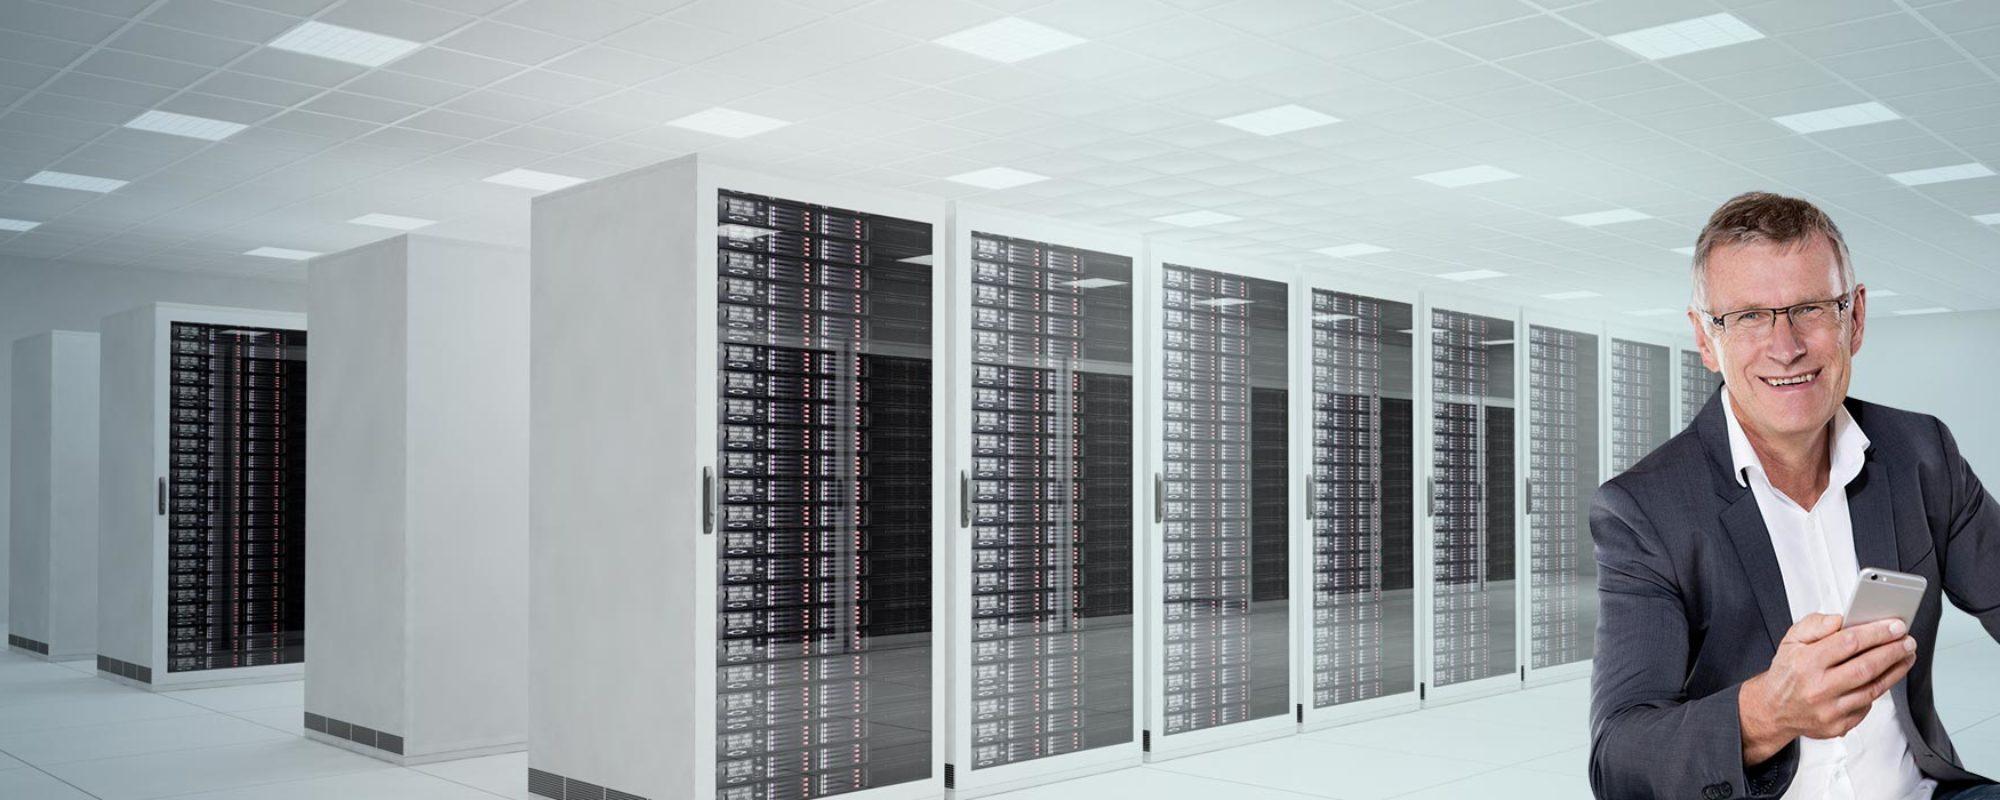 advasco Service-IT - Das Unternehmen